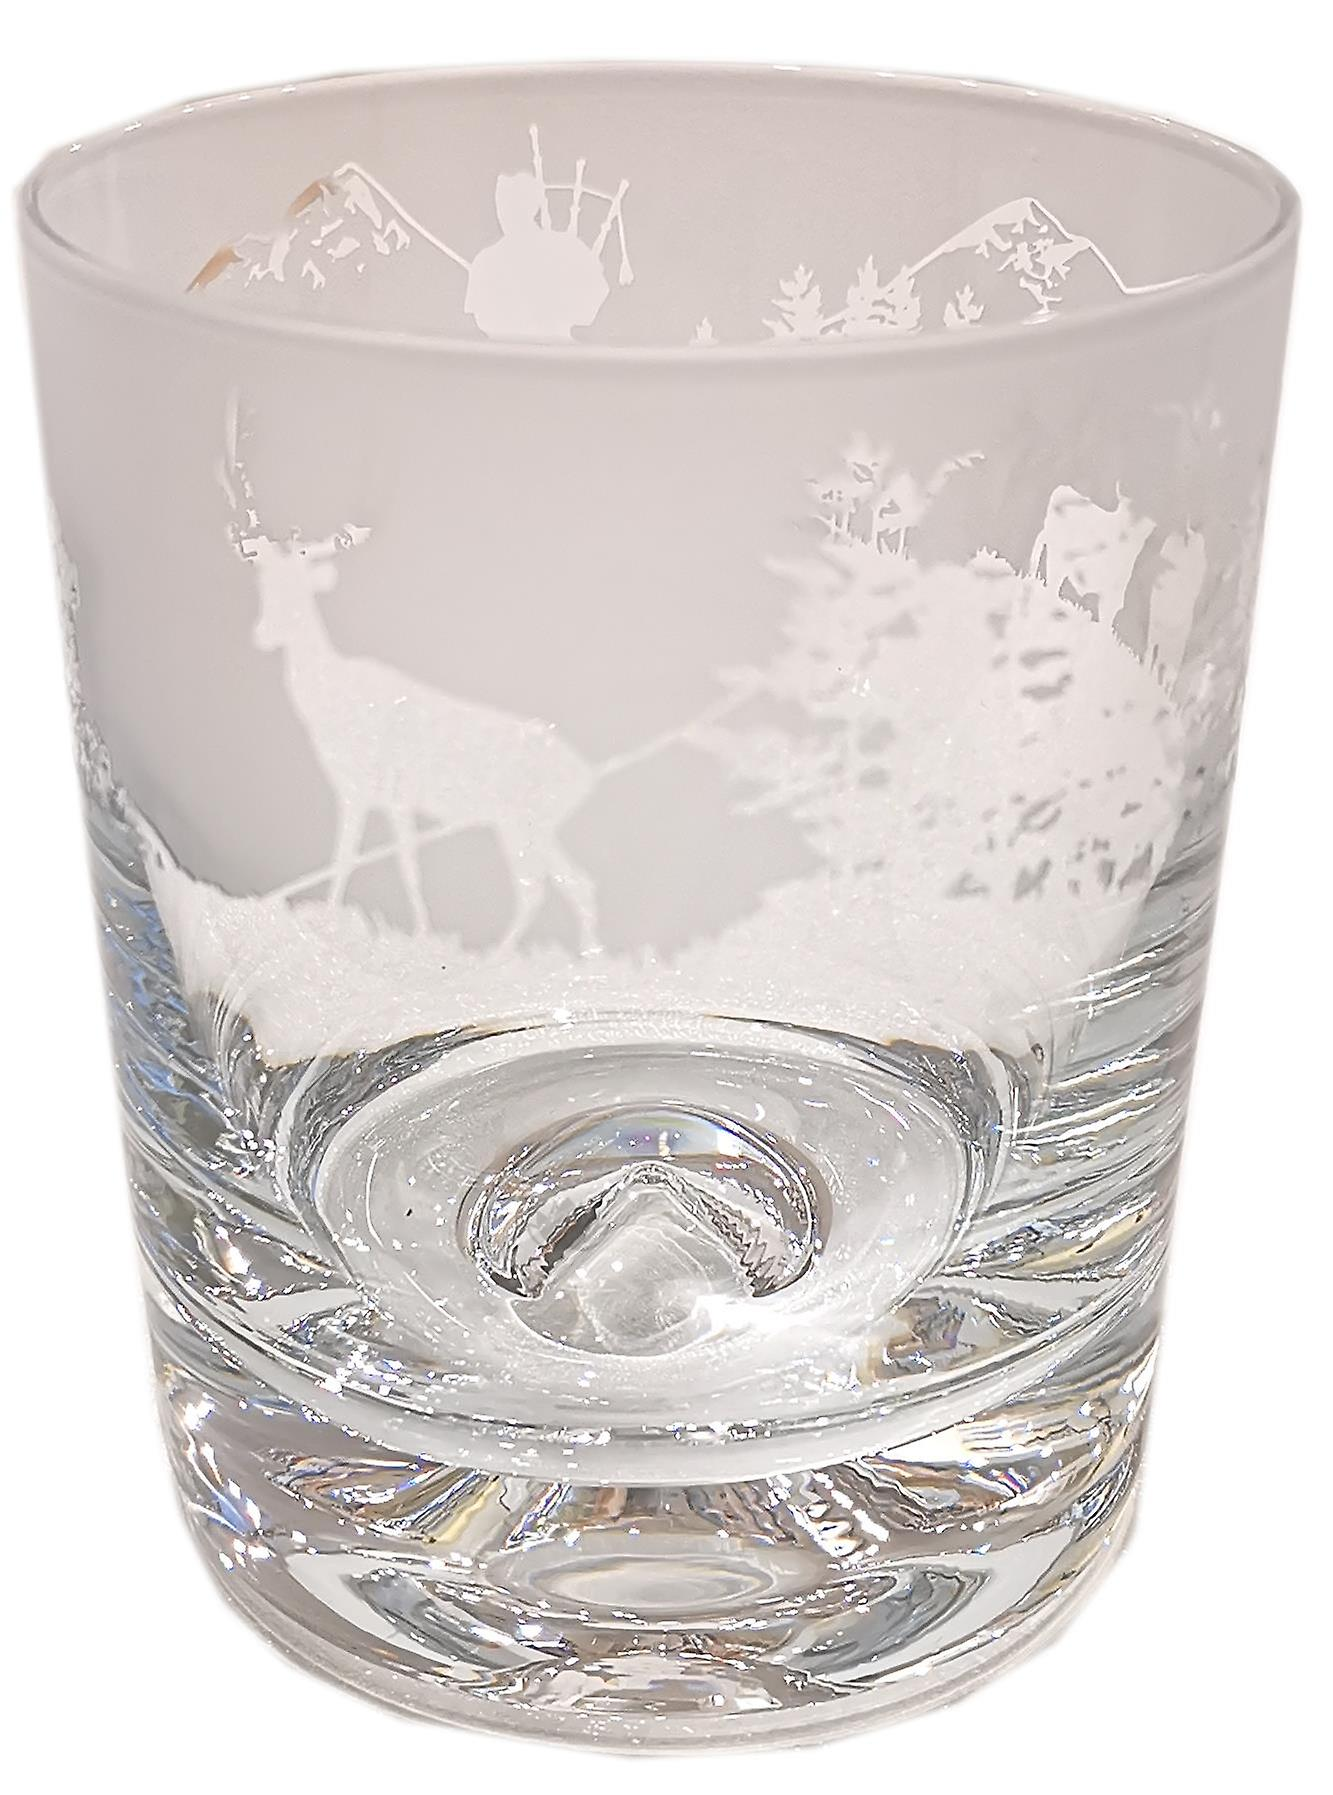 Animo Glass Crystal Whisky Tumbler 30cl - Scottish